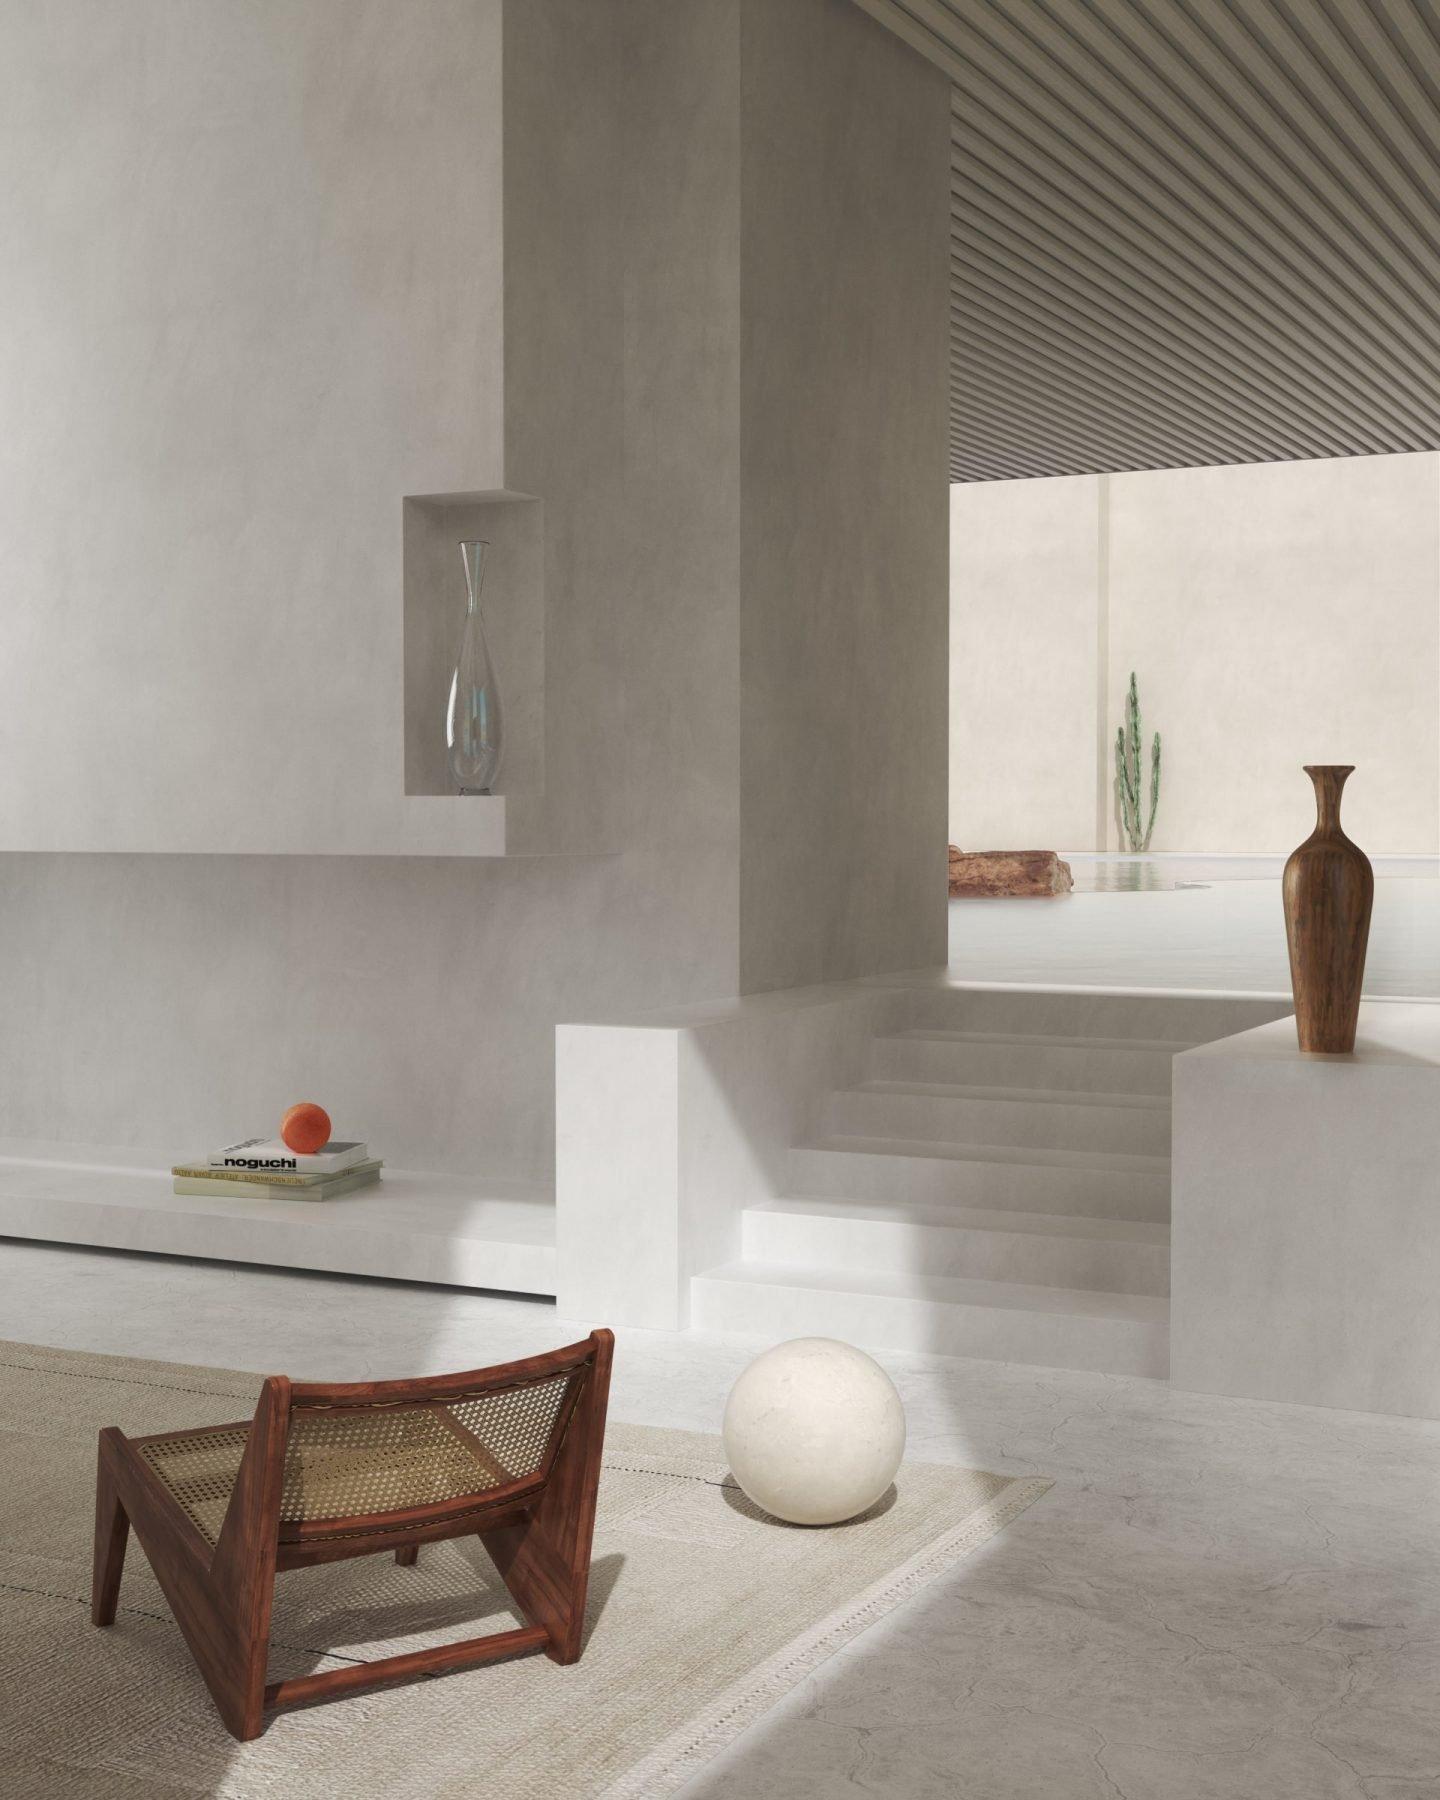 IGNANT-Design-CharlotteTaylor-19